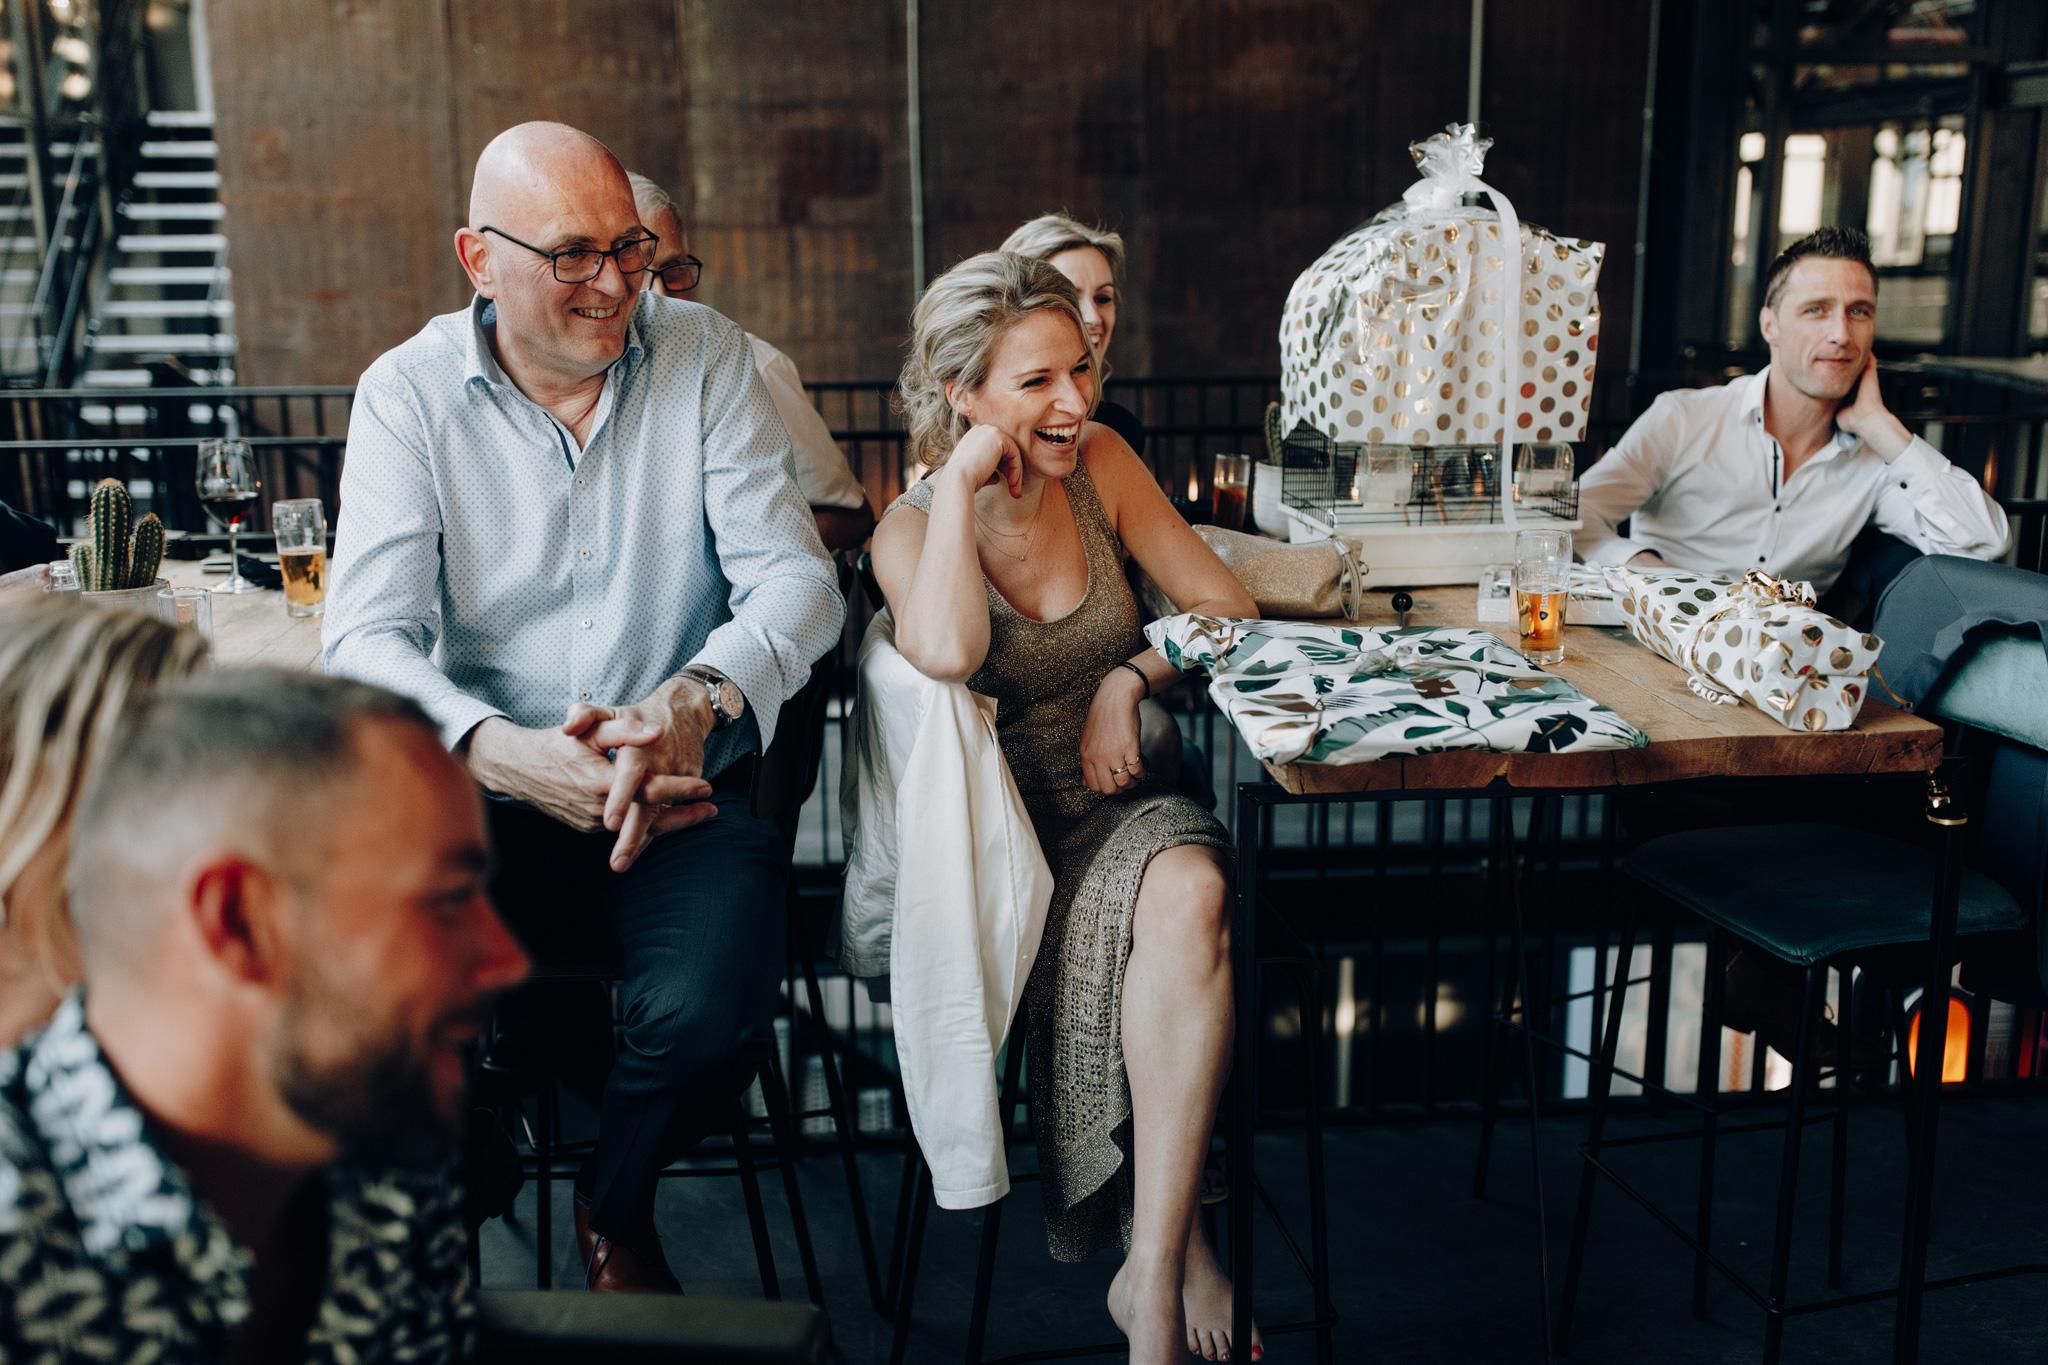 Gasten tijdens dinner in Proeffabriek in CHV Noordkade